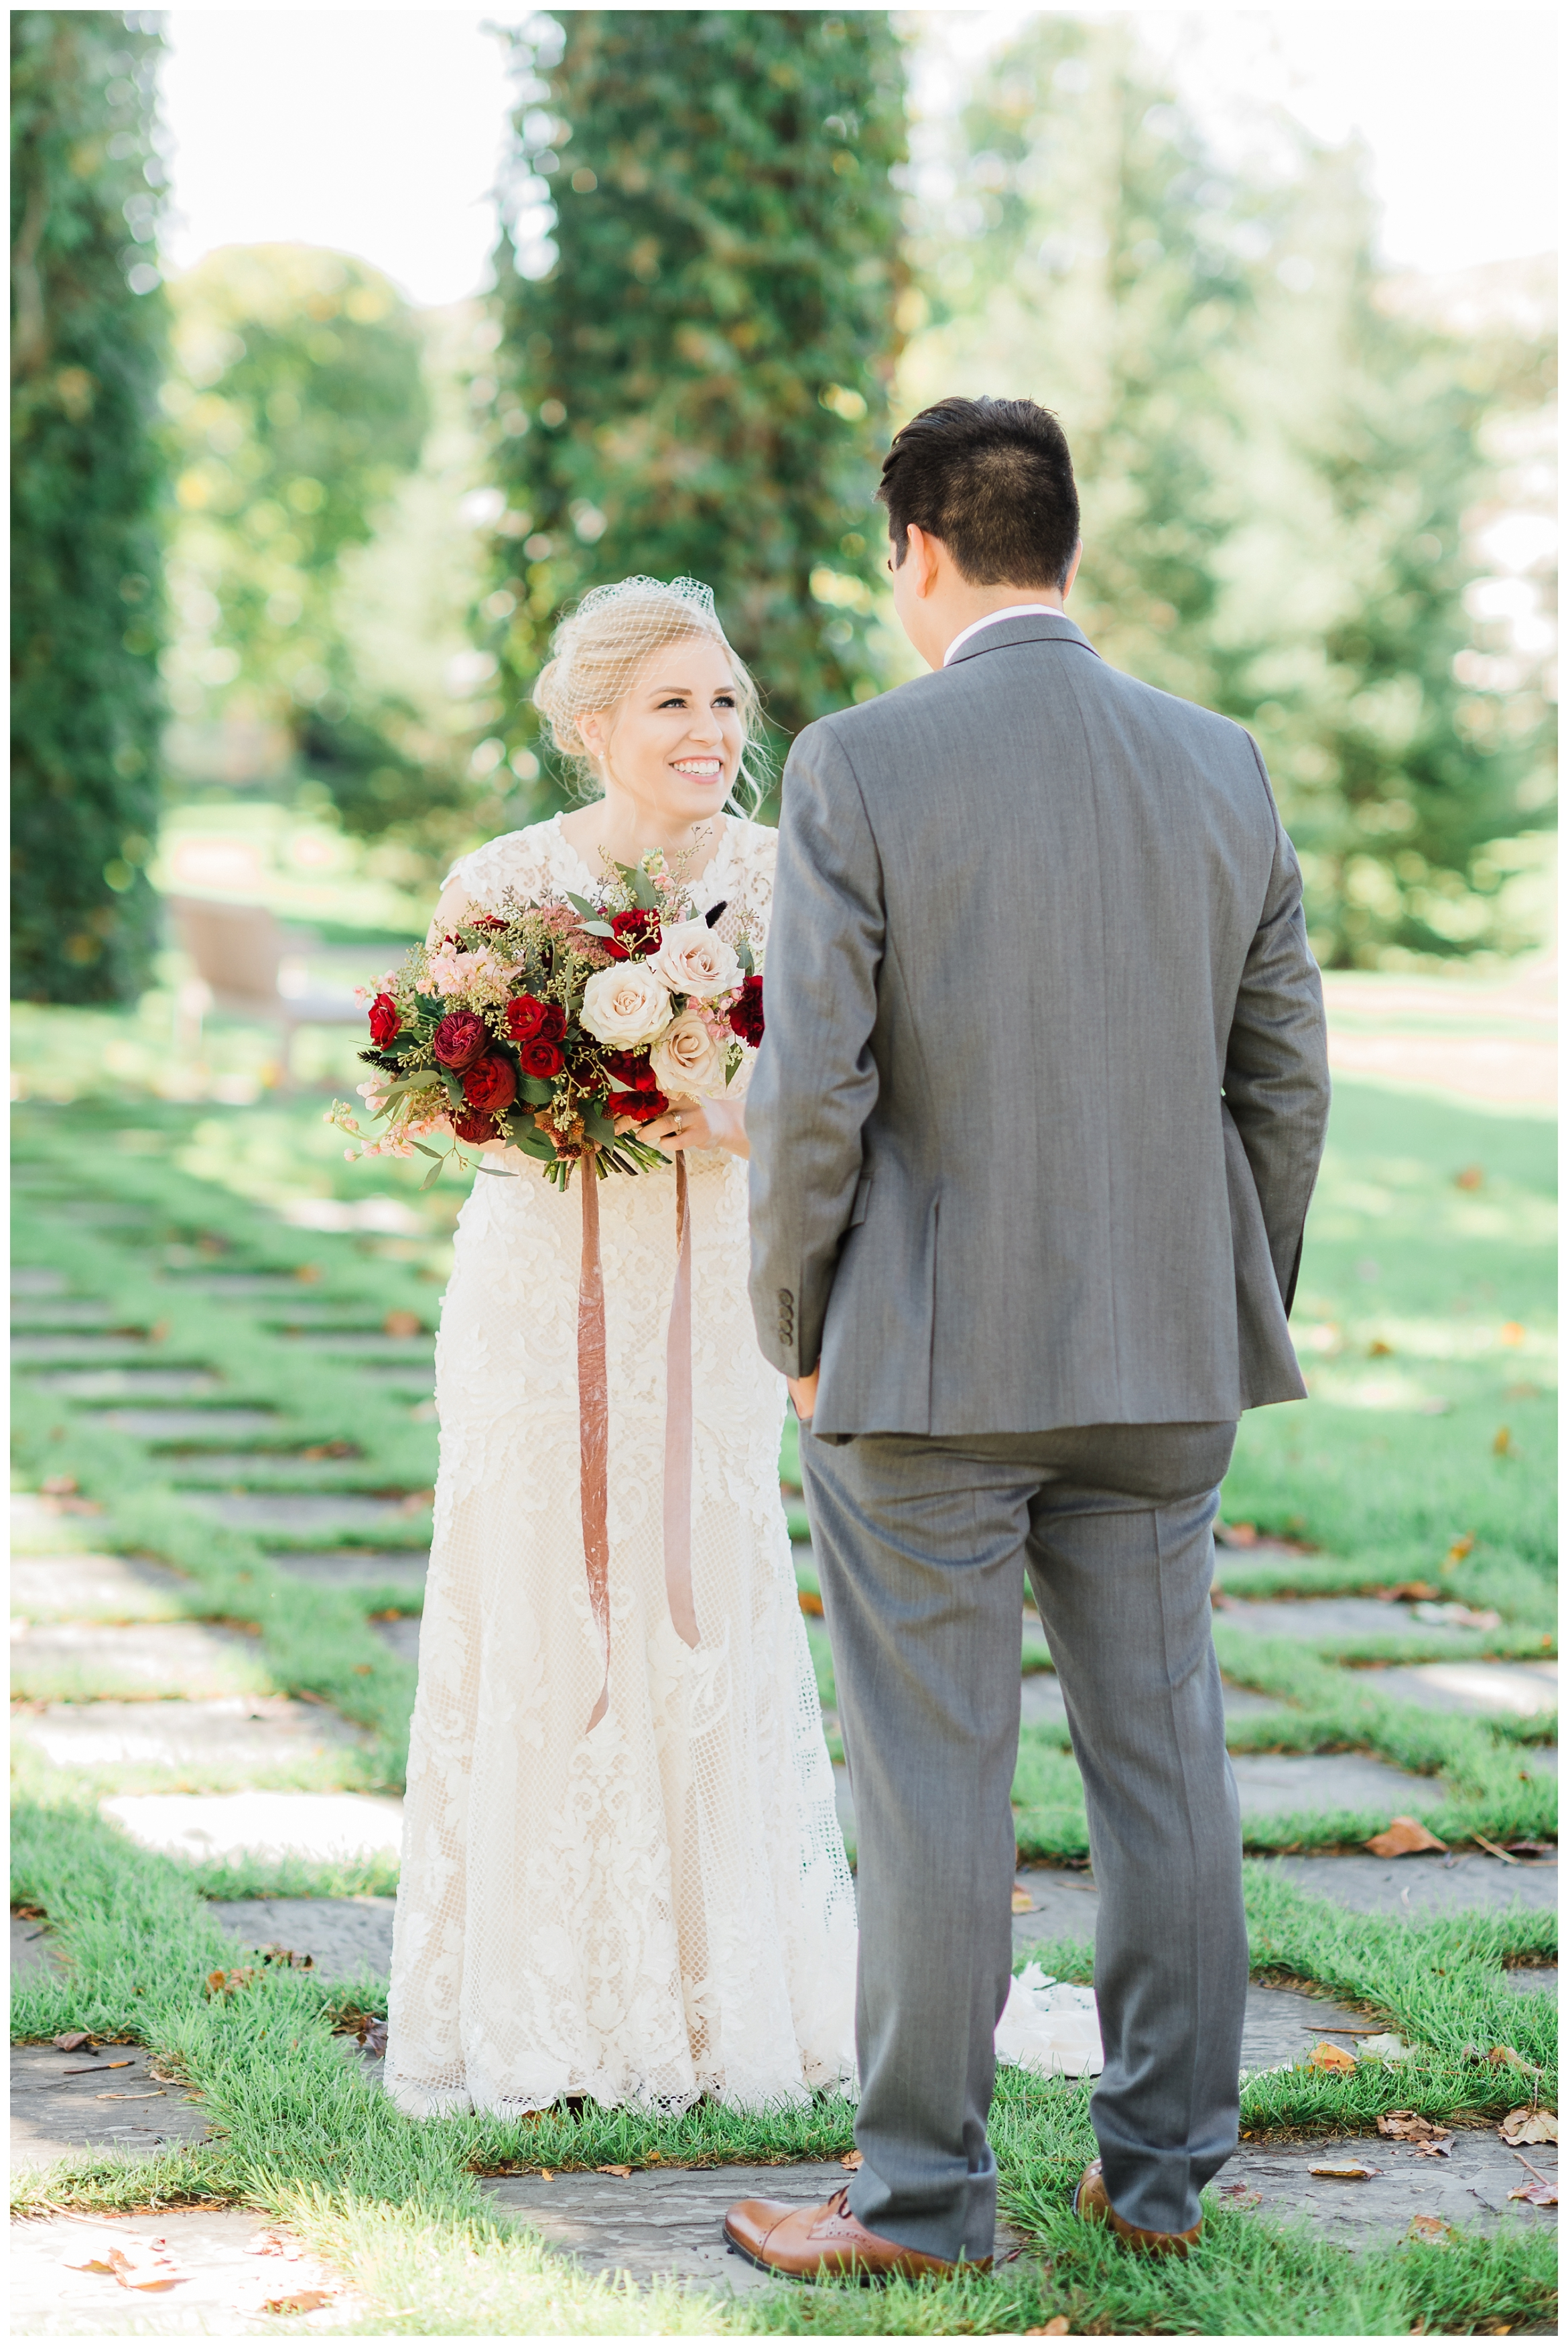 Rebecca_Shehorn_Photography_Indianapolis_Wedding_Photographer_7310.jpg